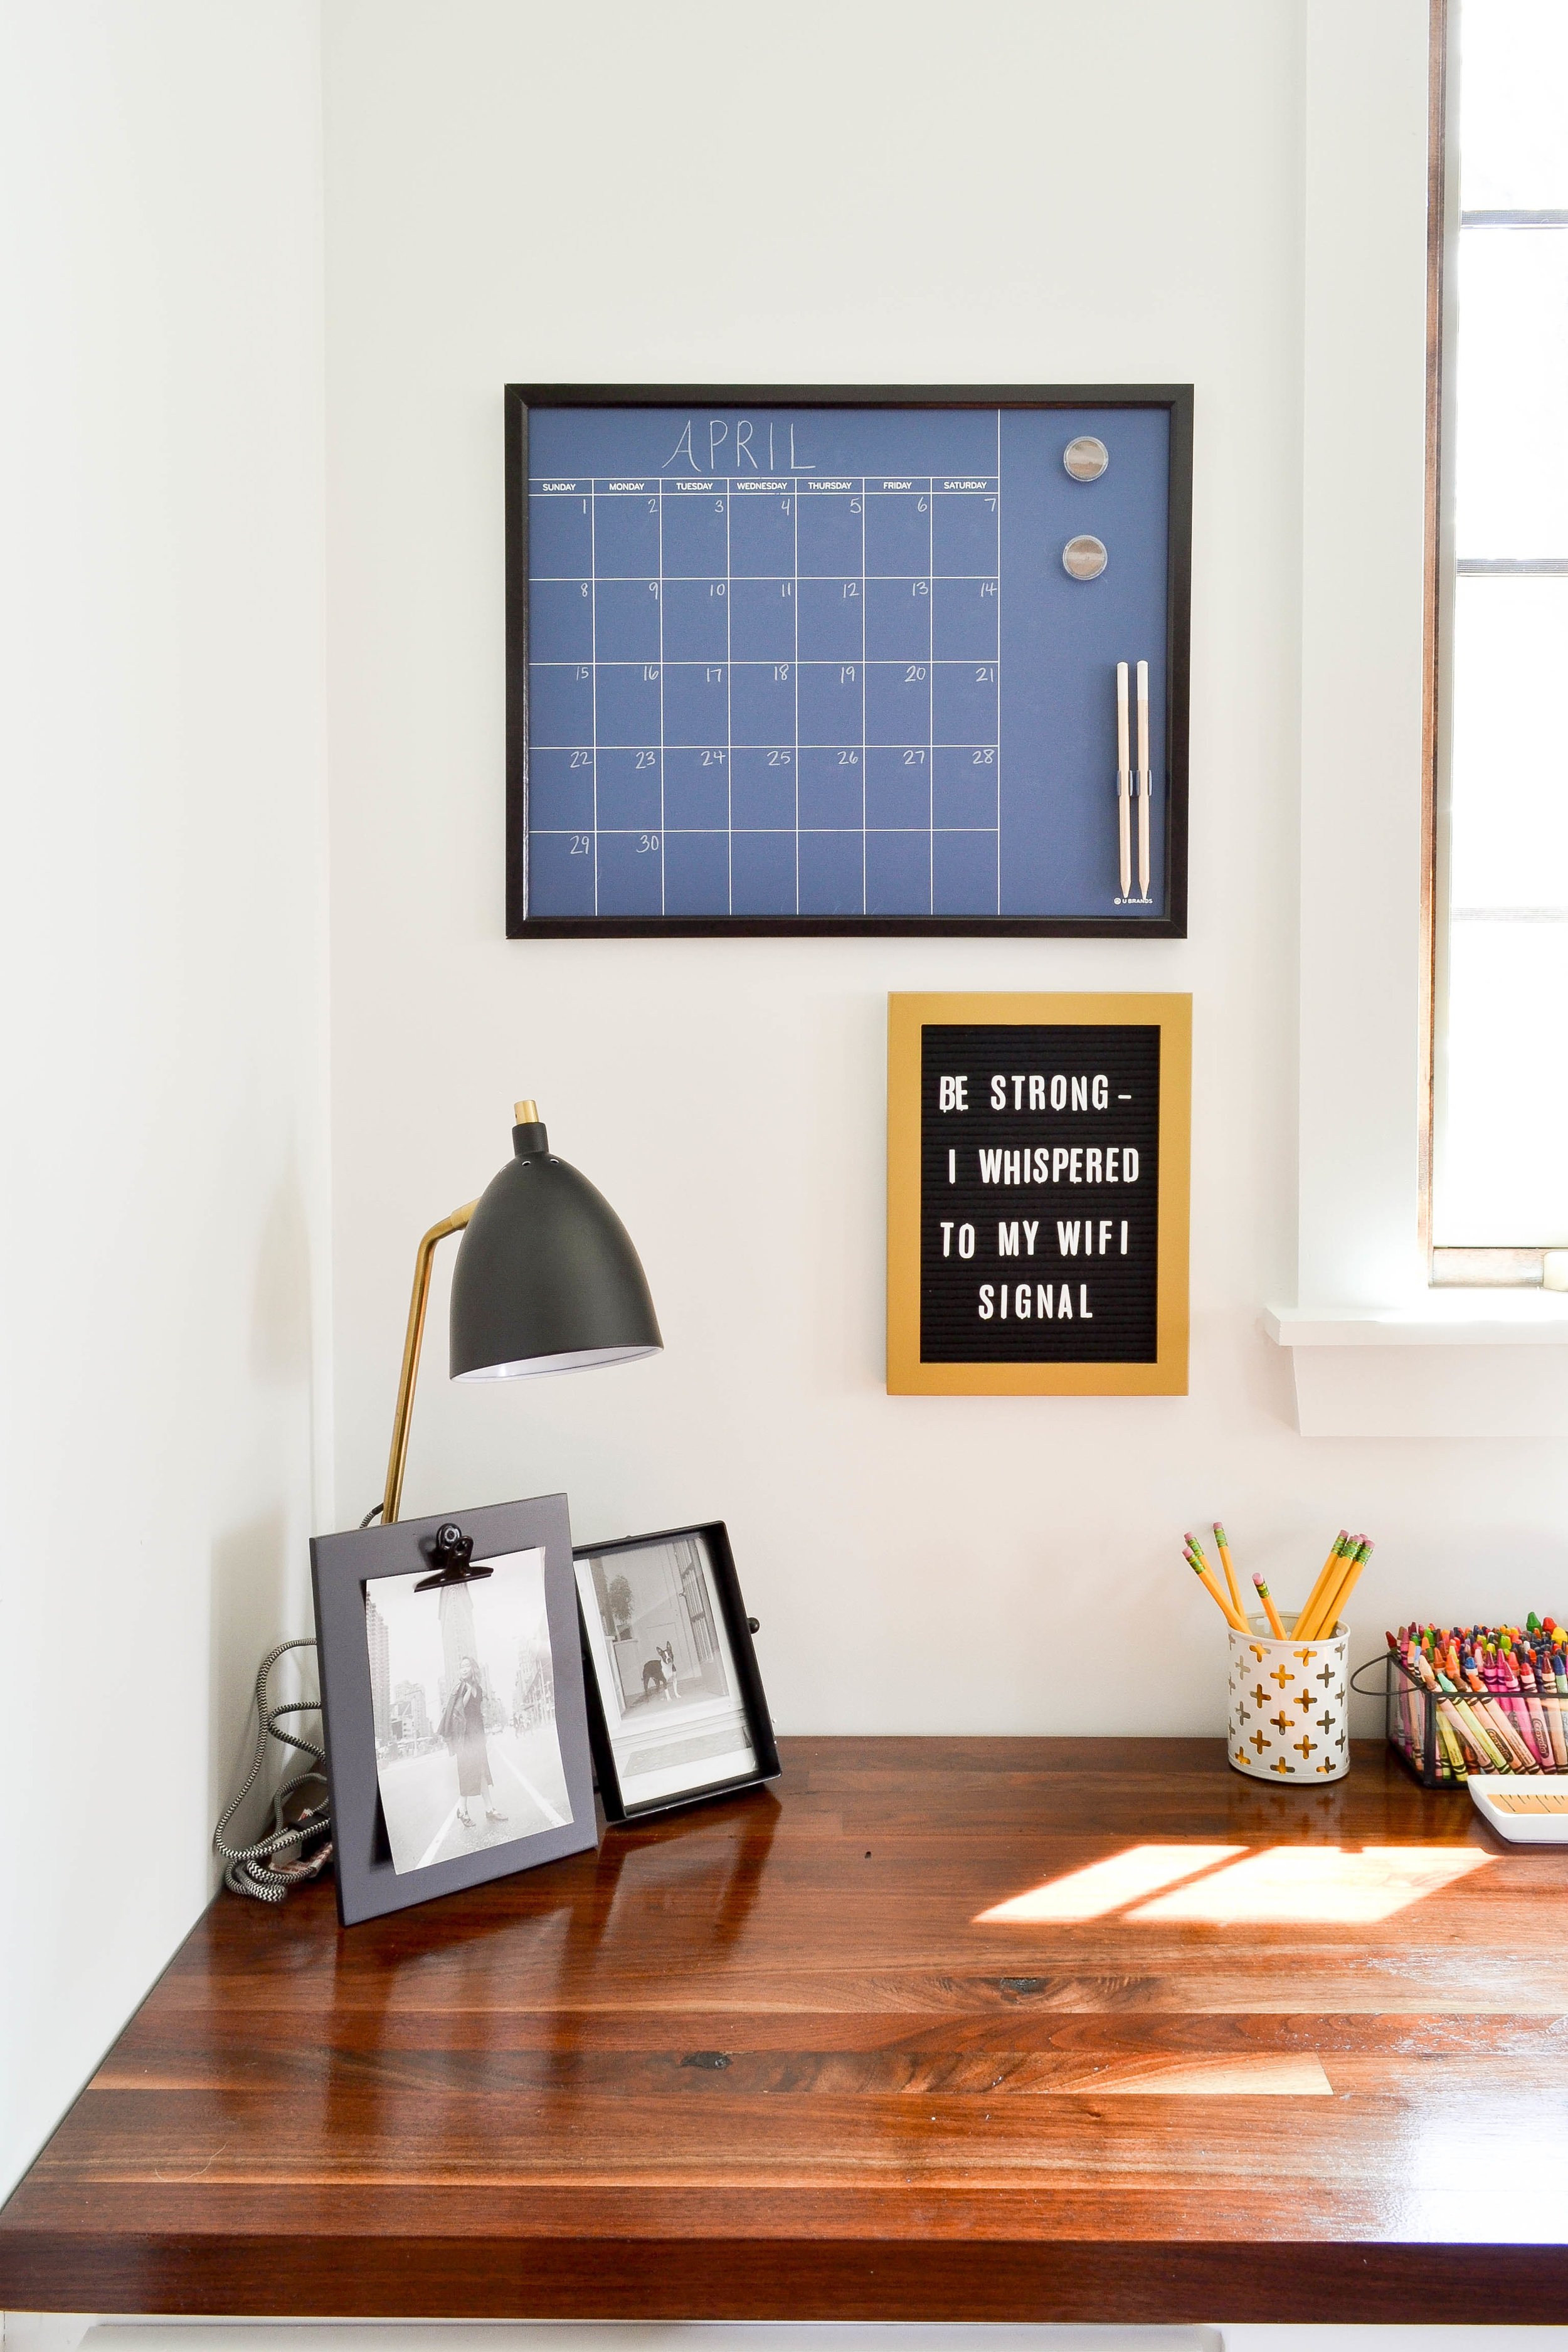 Gray Oak Studio Pilgrim Project Office Letterboard and calendar